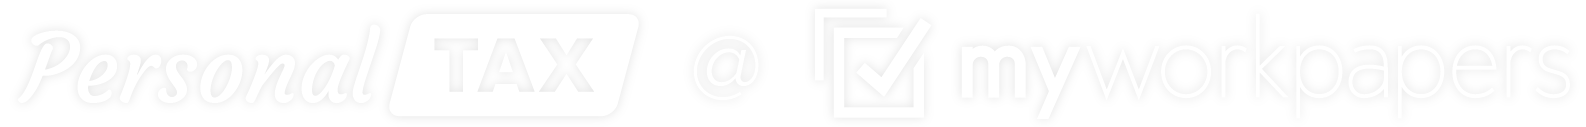 personal tax logos